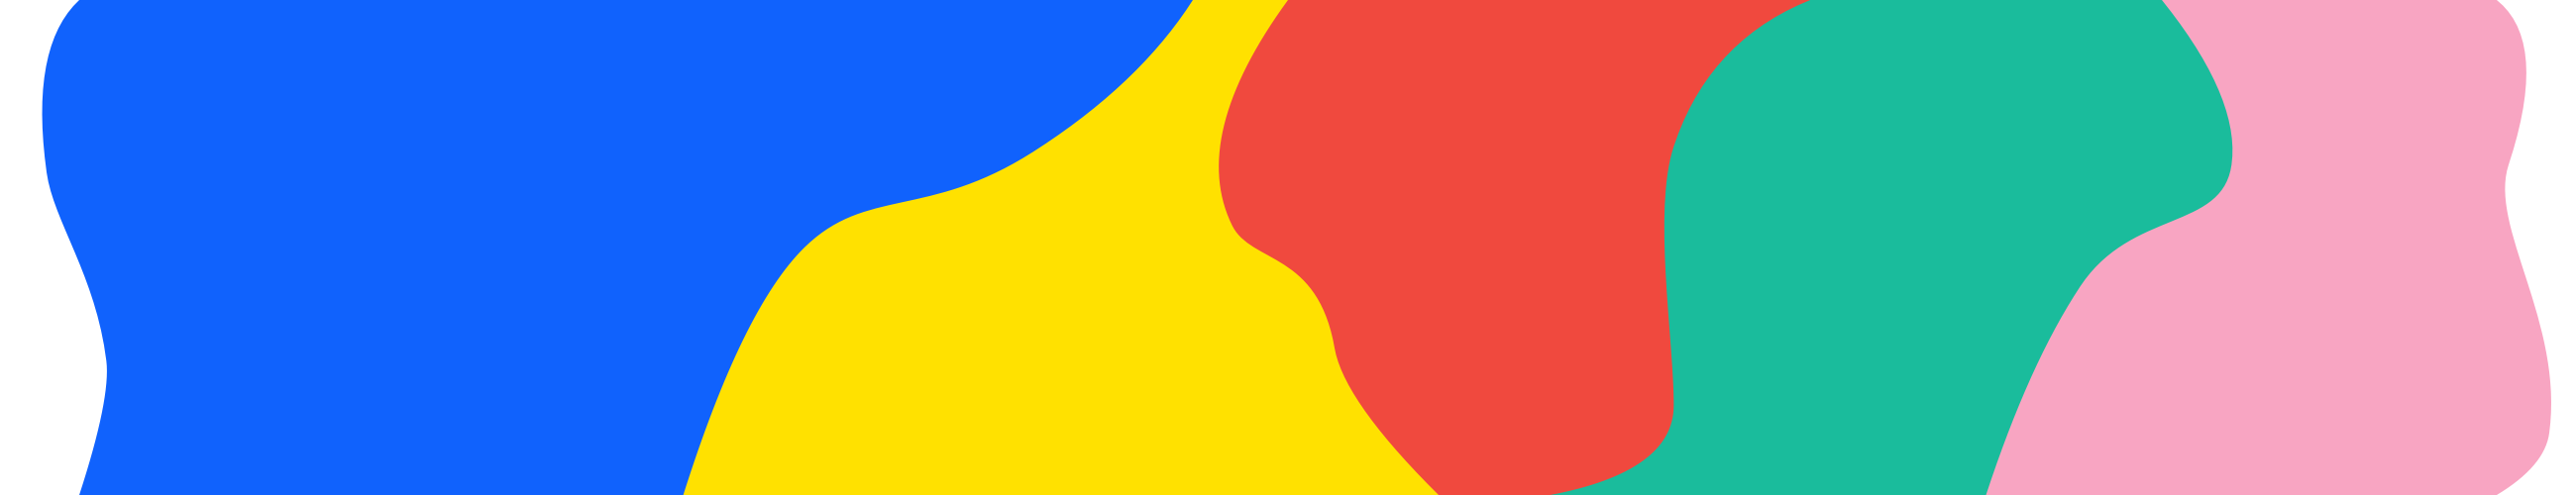 Colors_ontsnappi